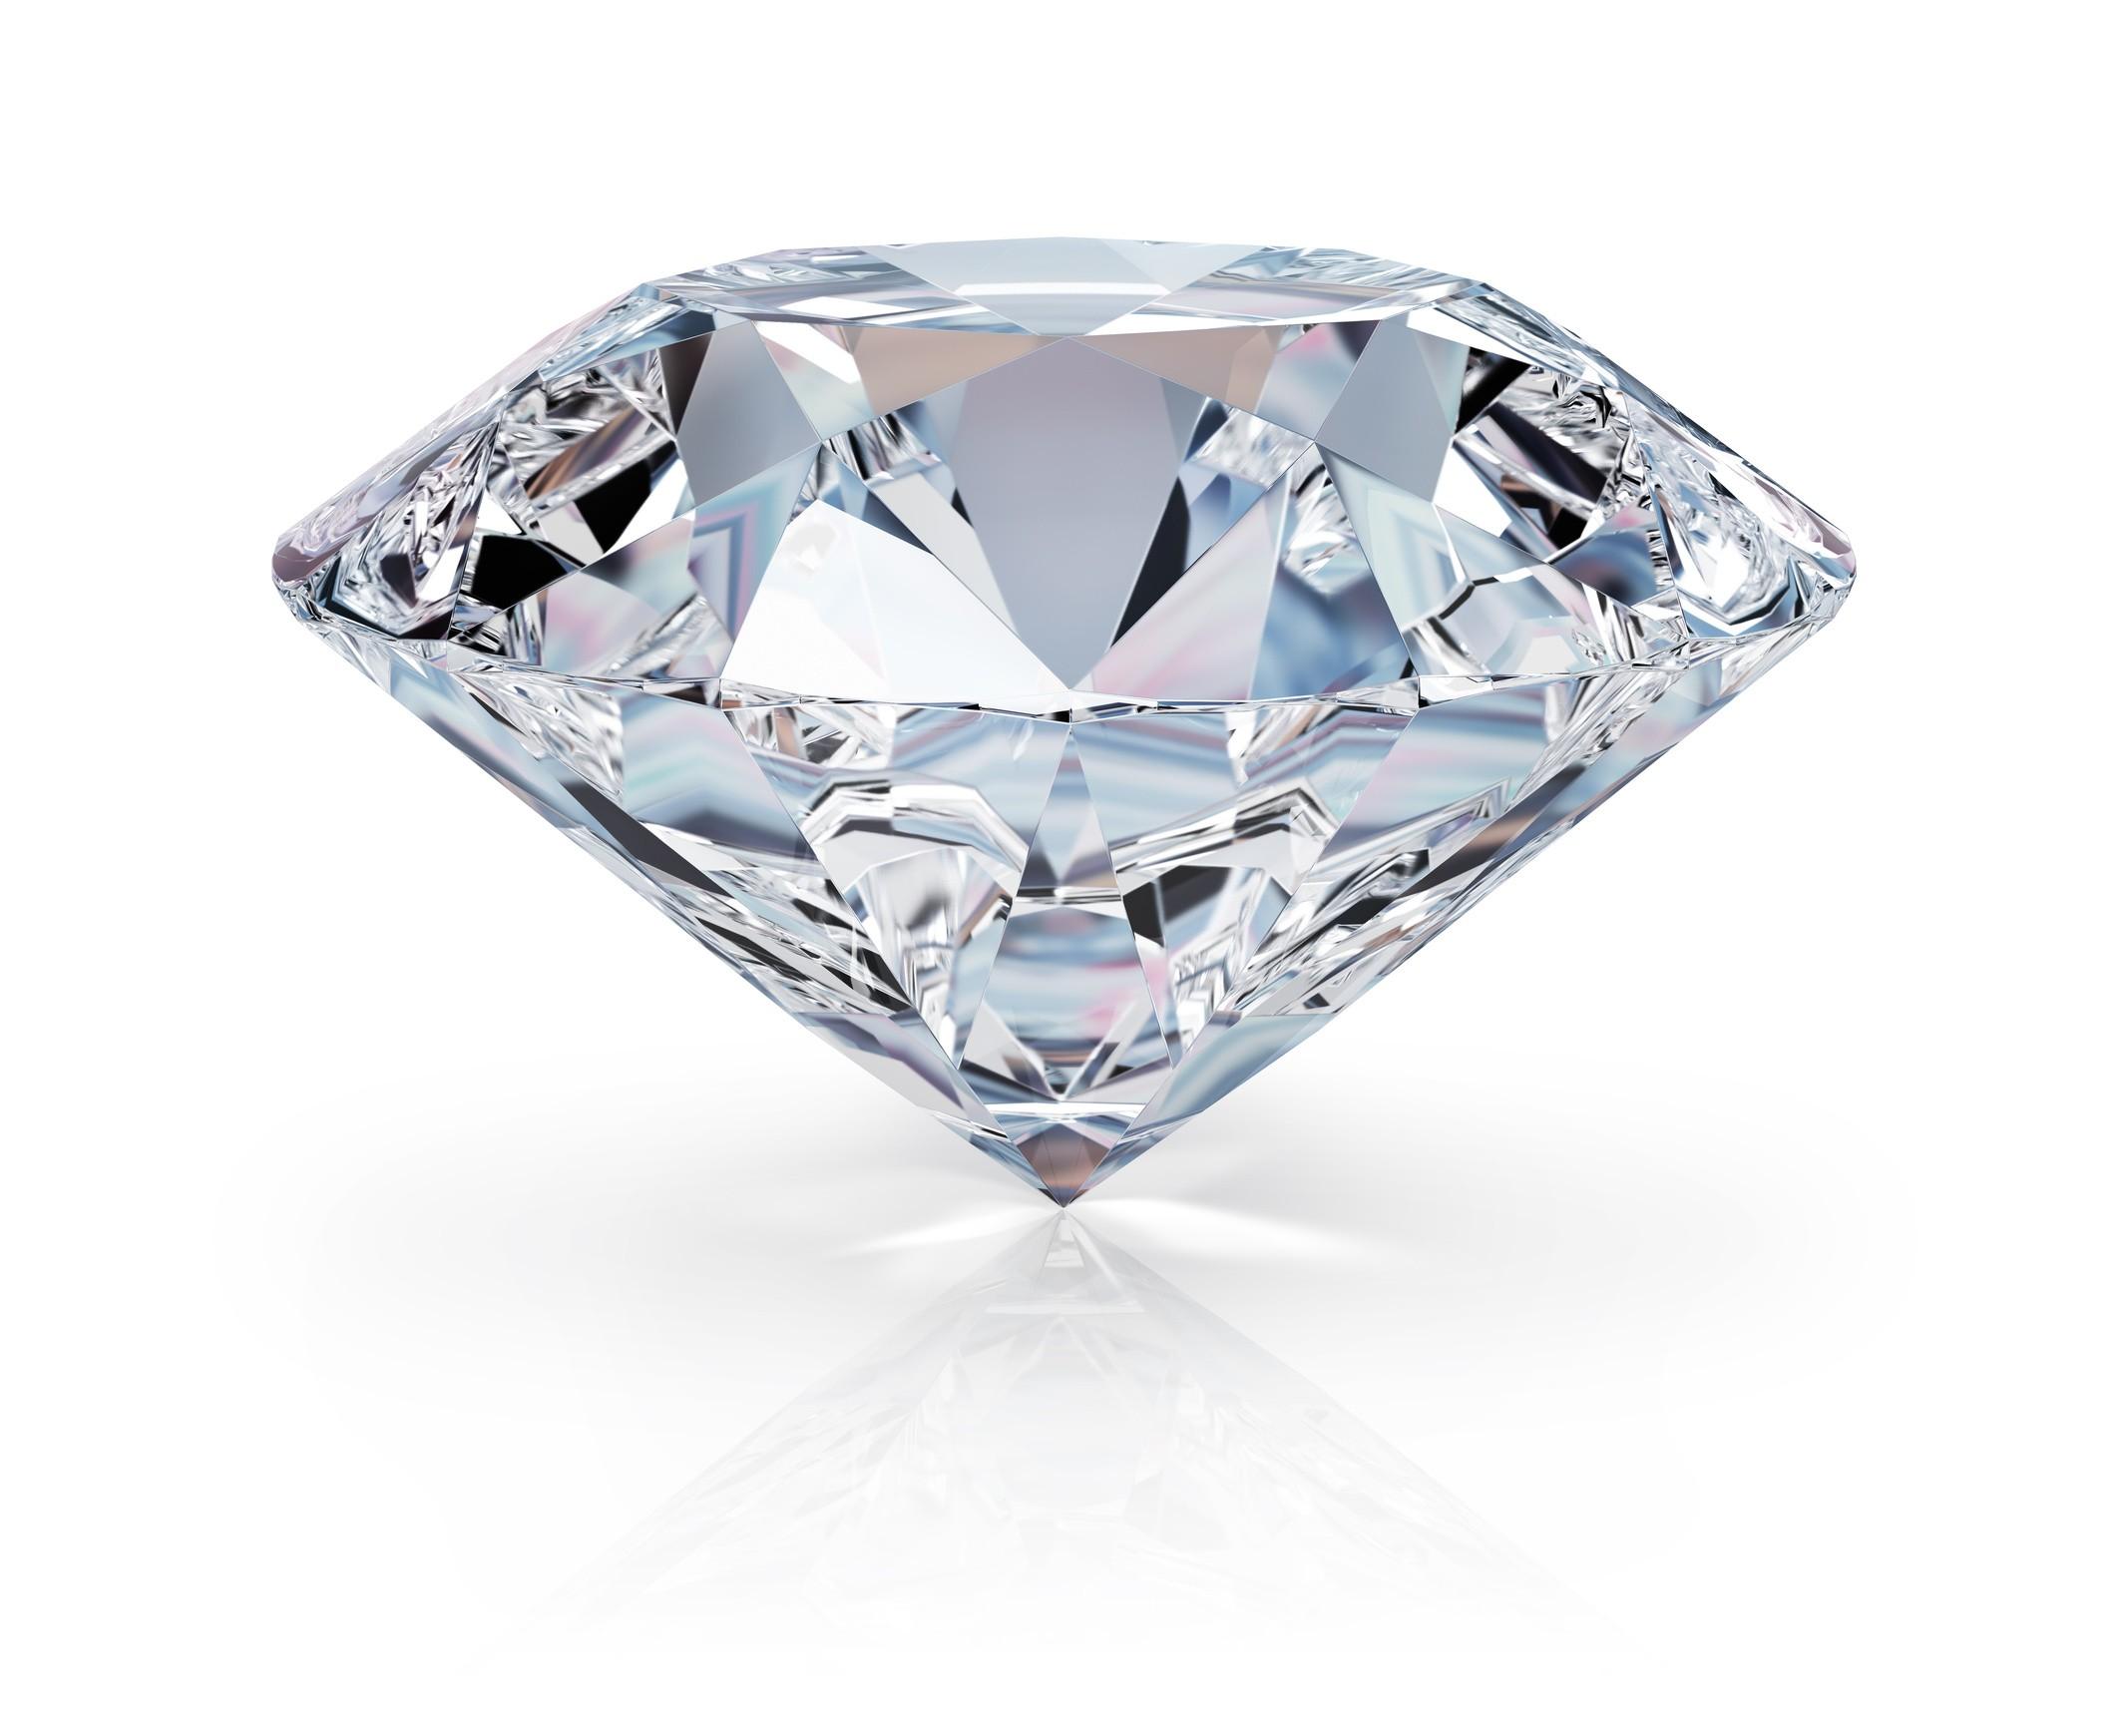 cara mengecek kualitas berlian